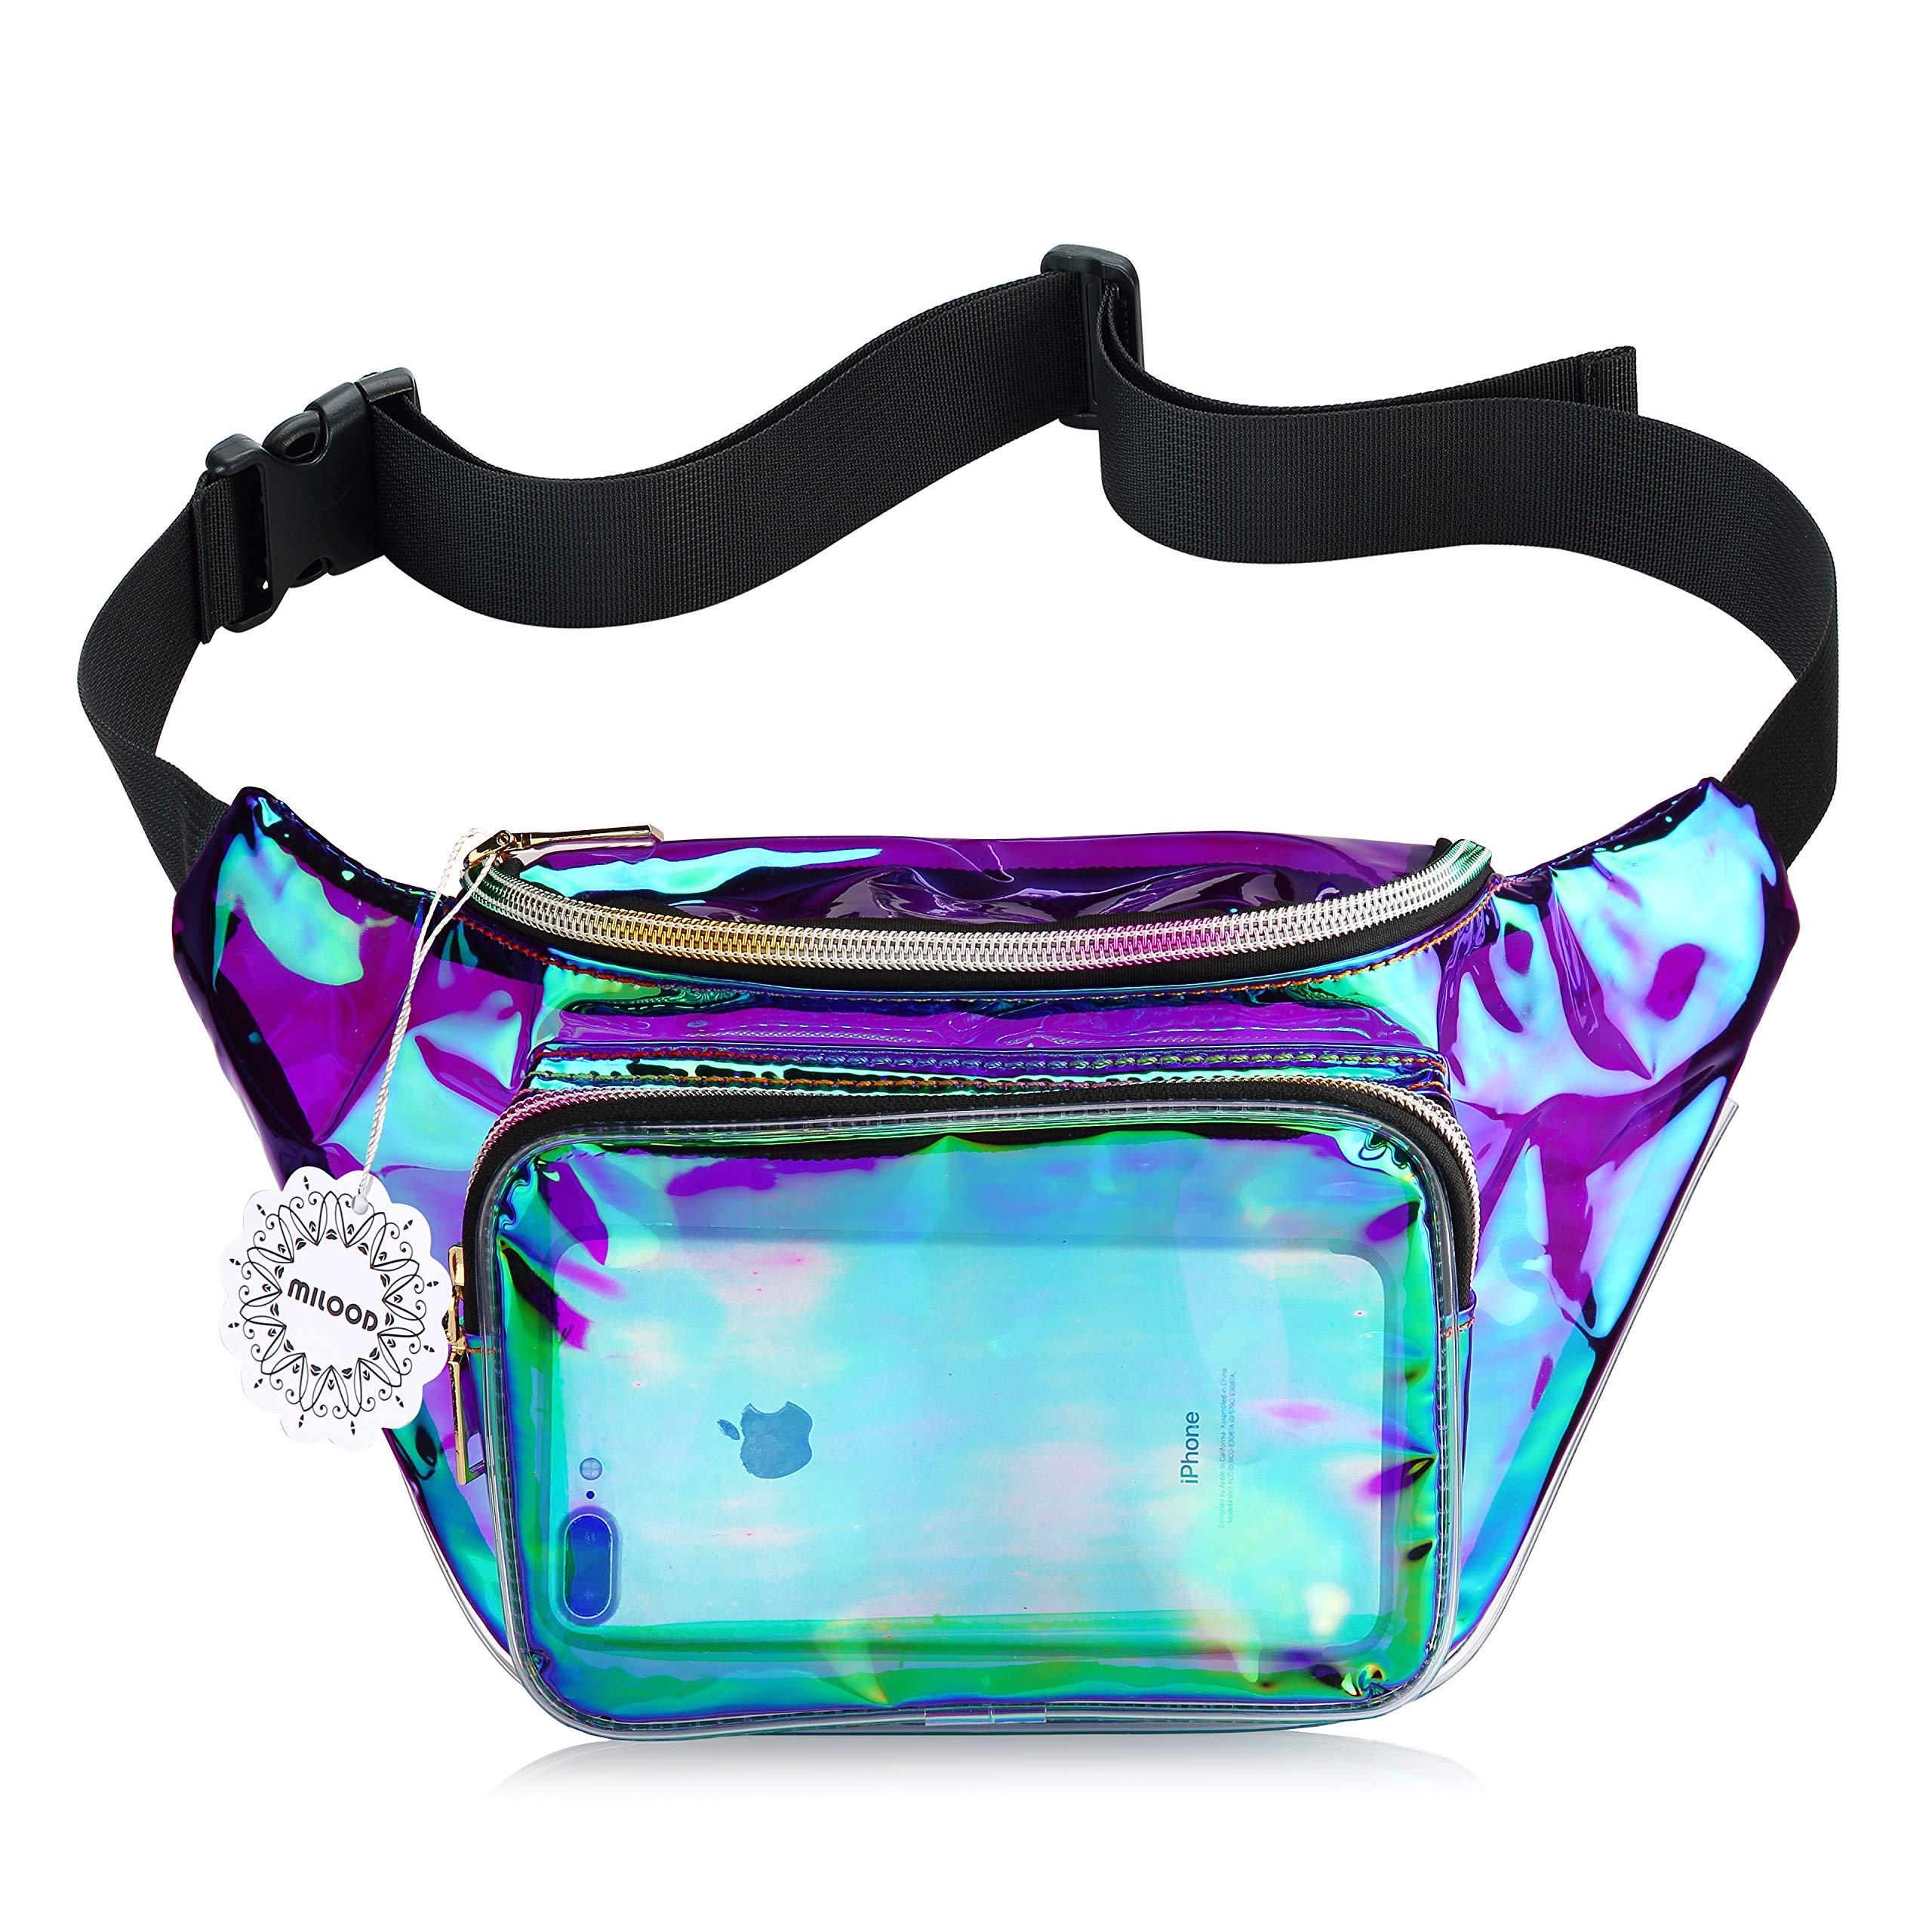 Shiny Neon Fanny Bag for Women Rave Festival Hologram Bum Travel Waist Pack (Iridescent Purple)